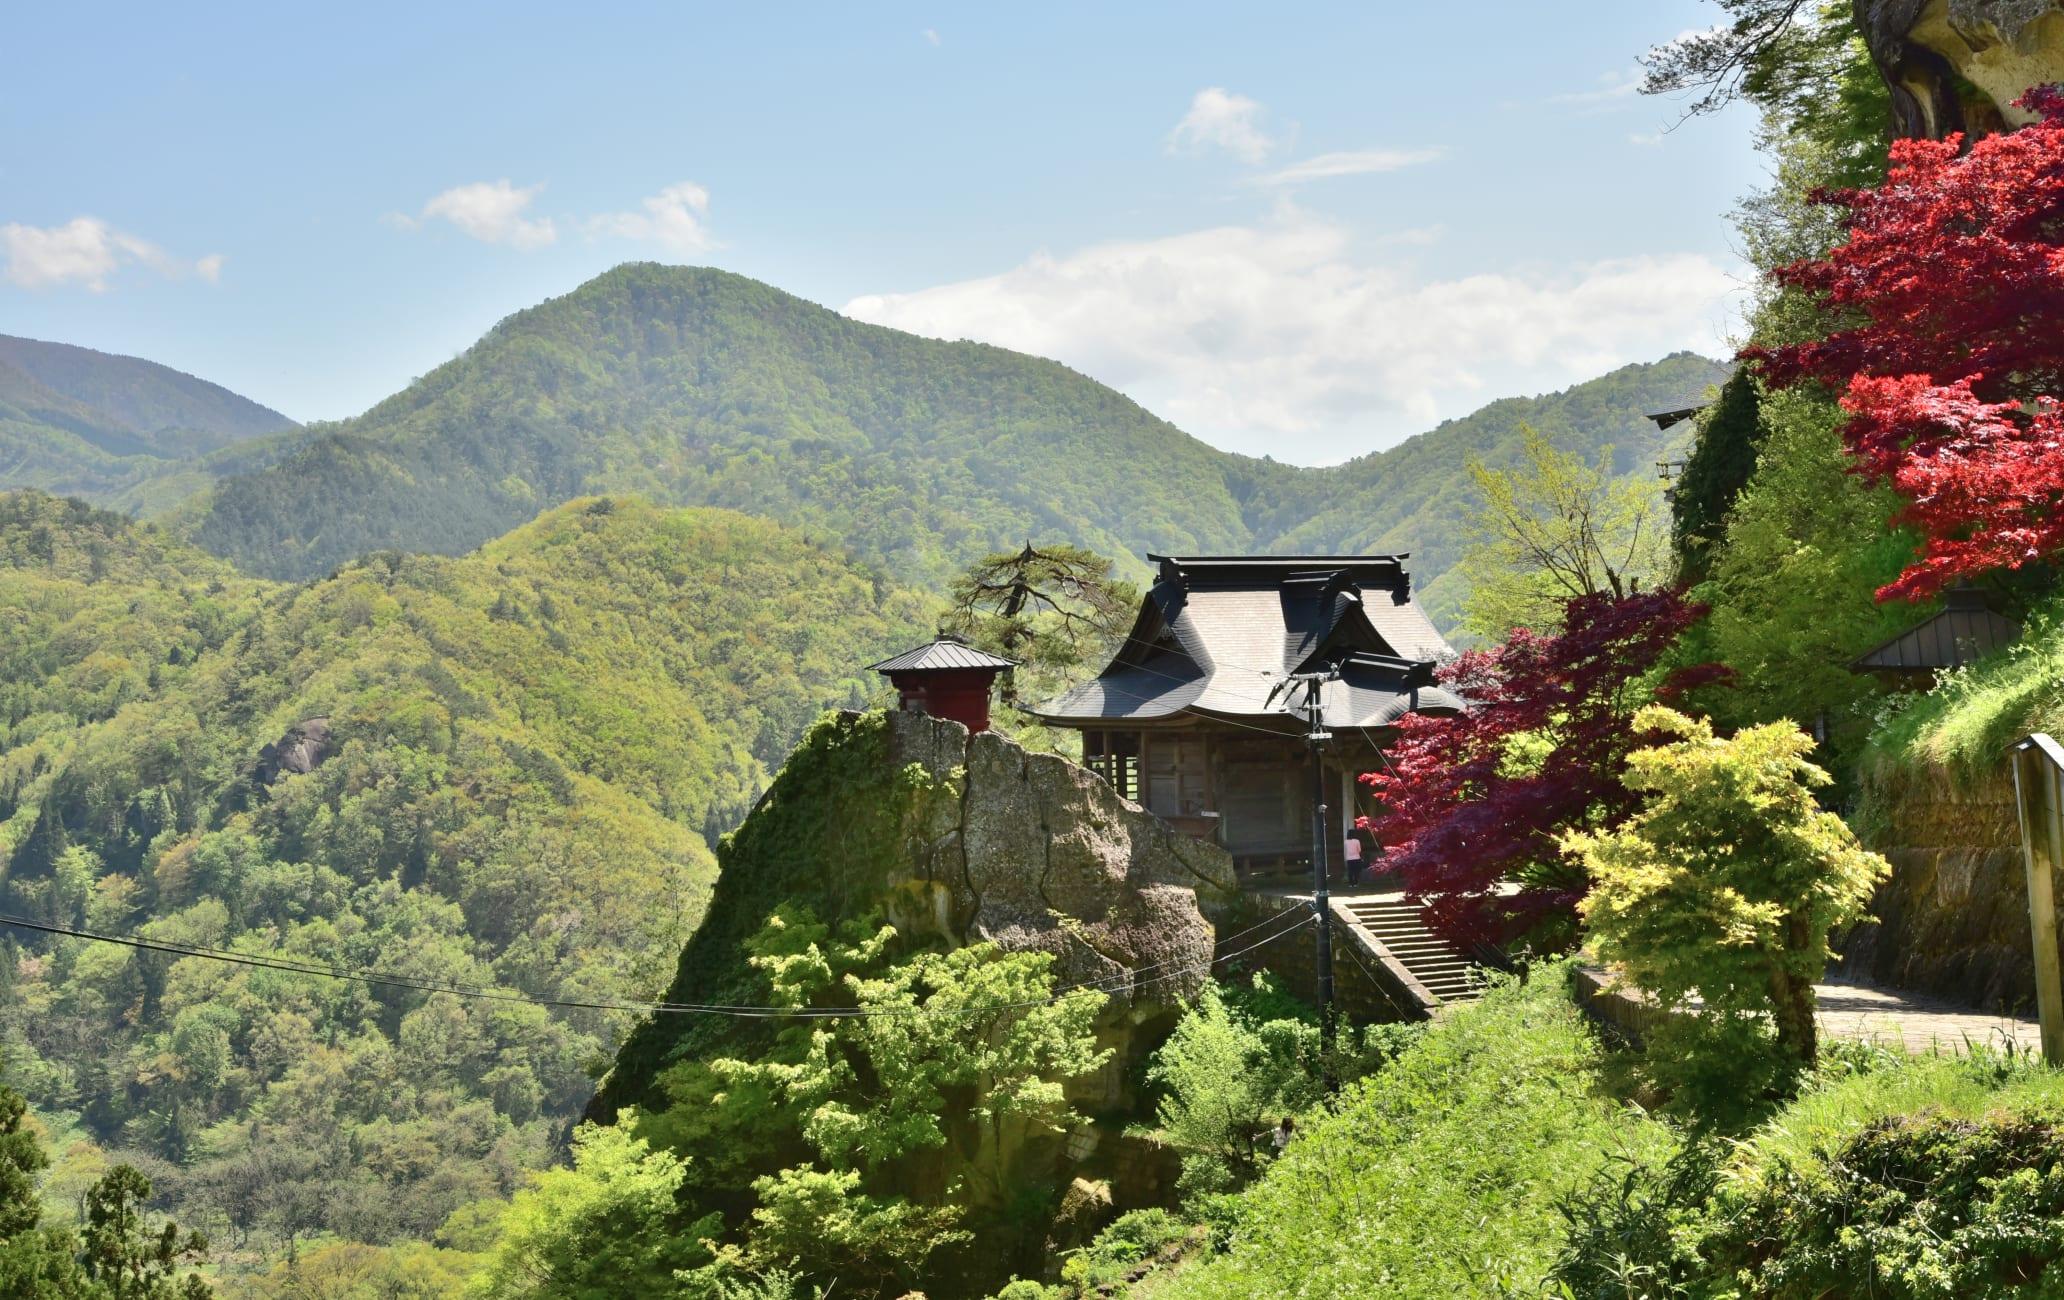 risshaku-ji temple -yama-dera temple